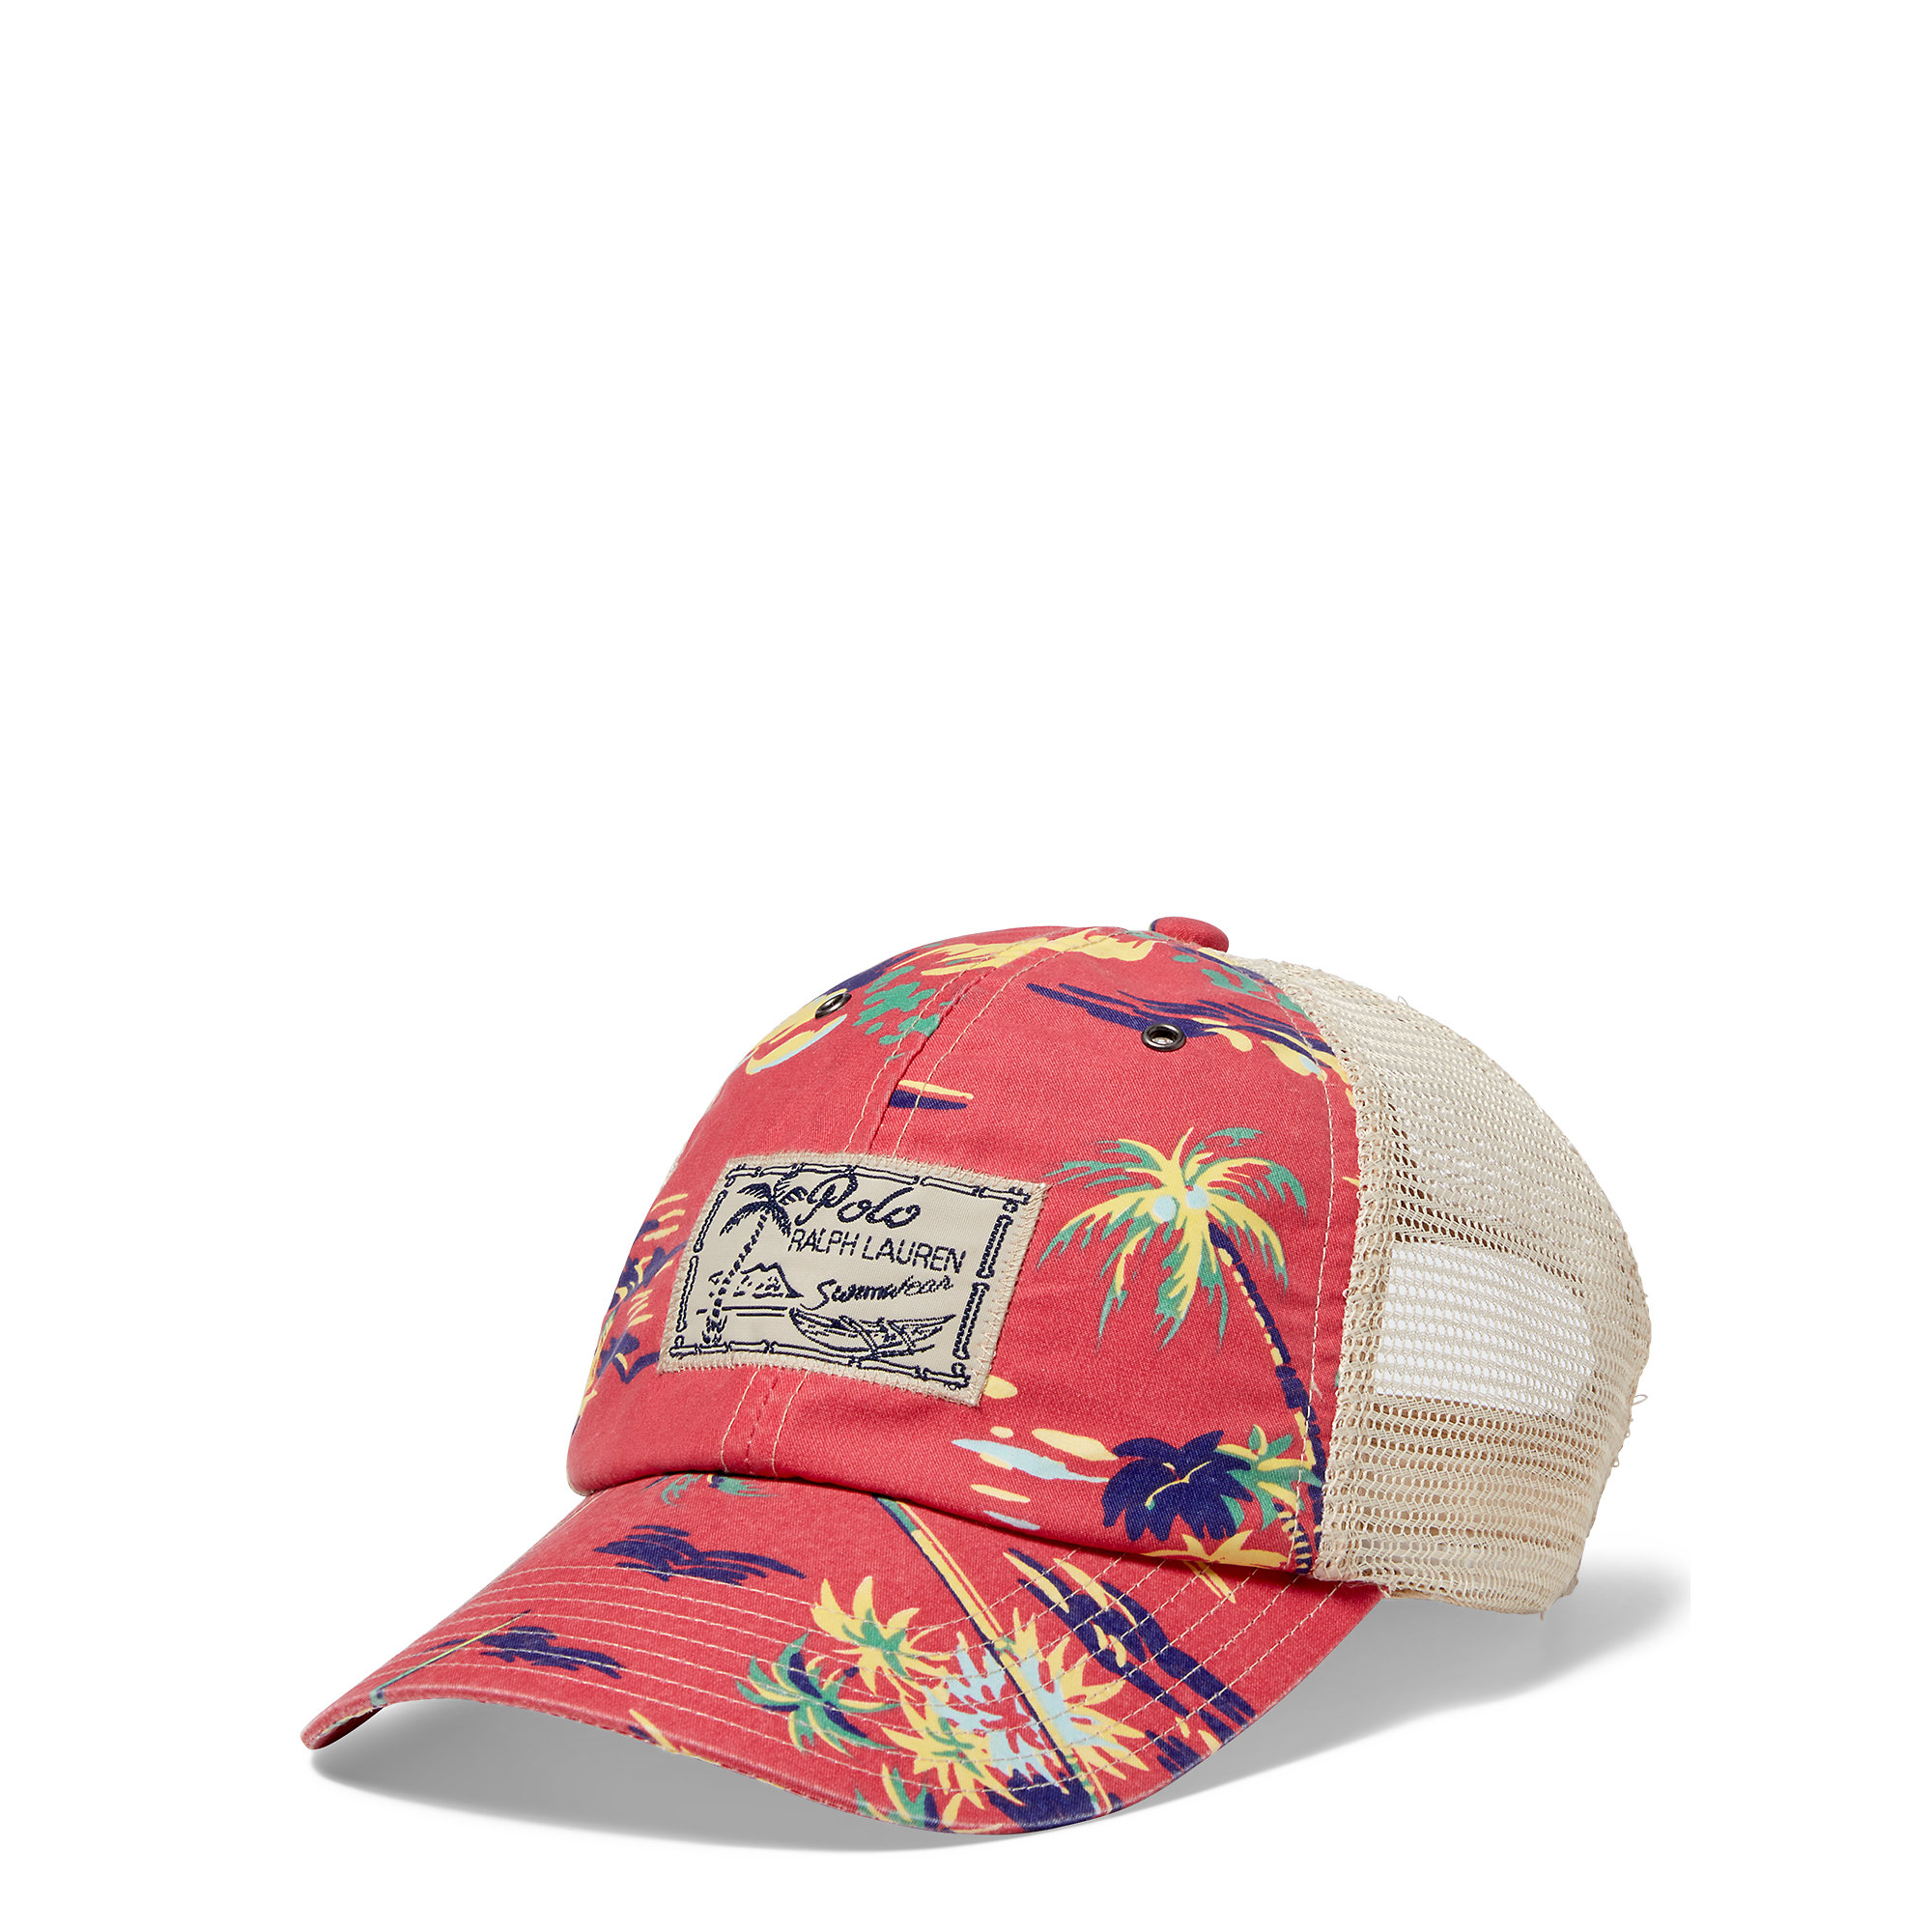 Lyst - Polo Ralph Lauren Mesh Trucker Hat in Red for Men f9dc90c63f24